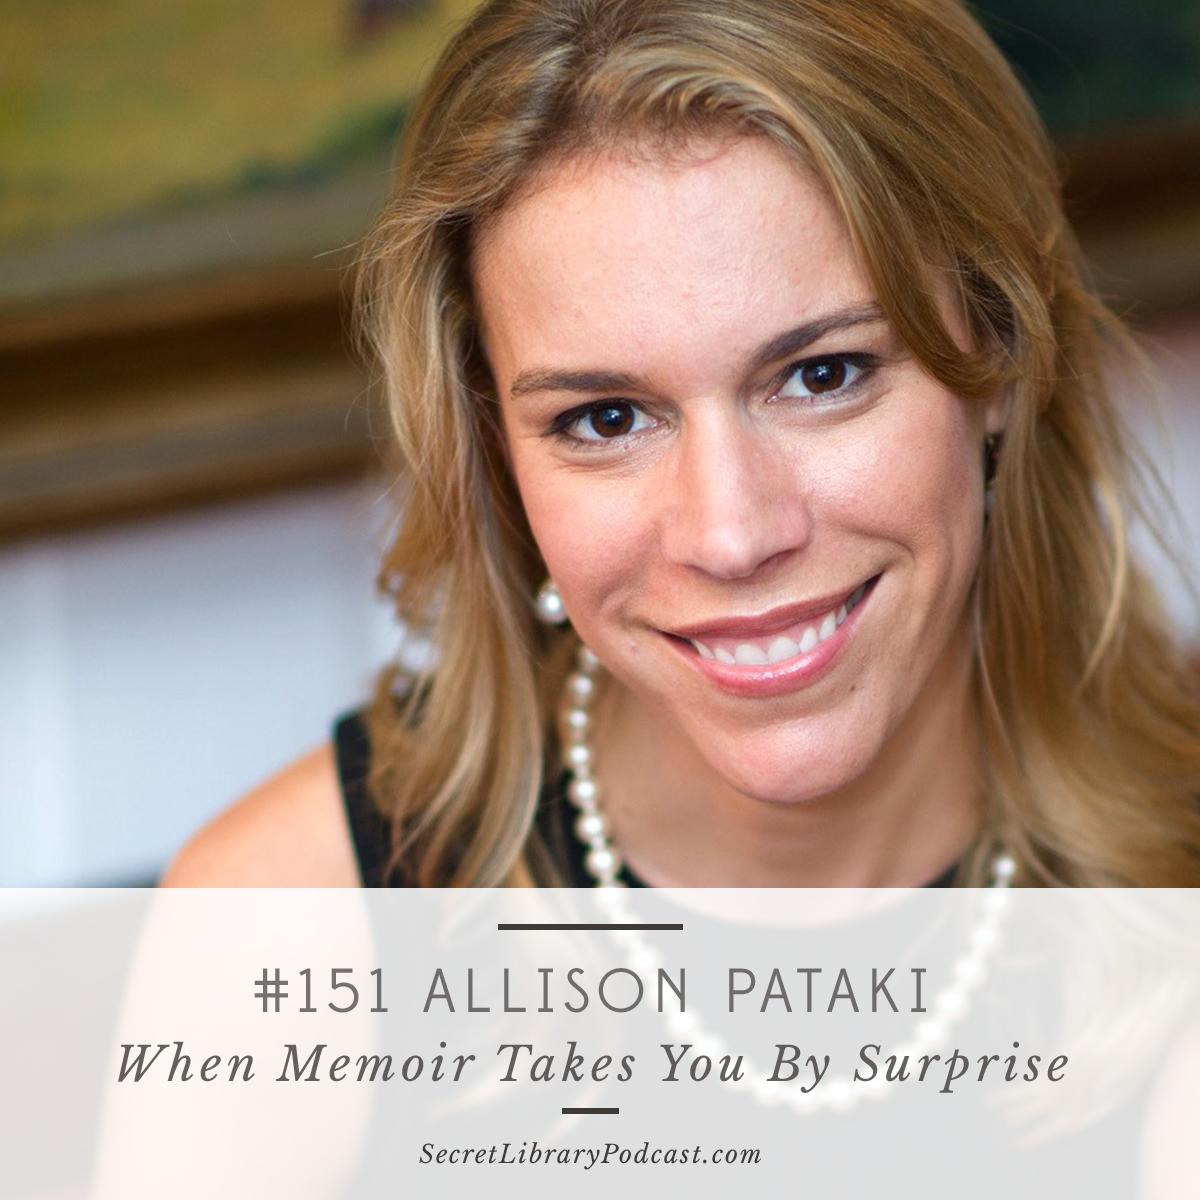 152-Allison-PatakiIG-Square.png